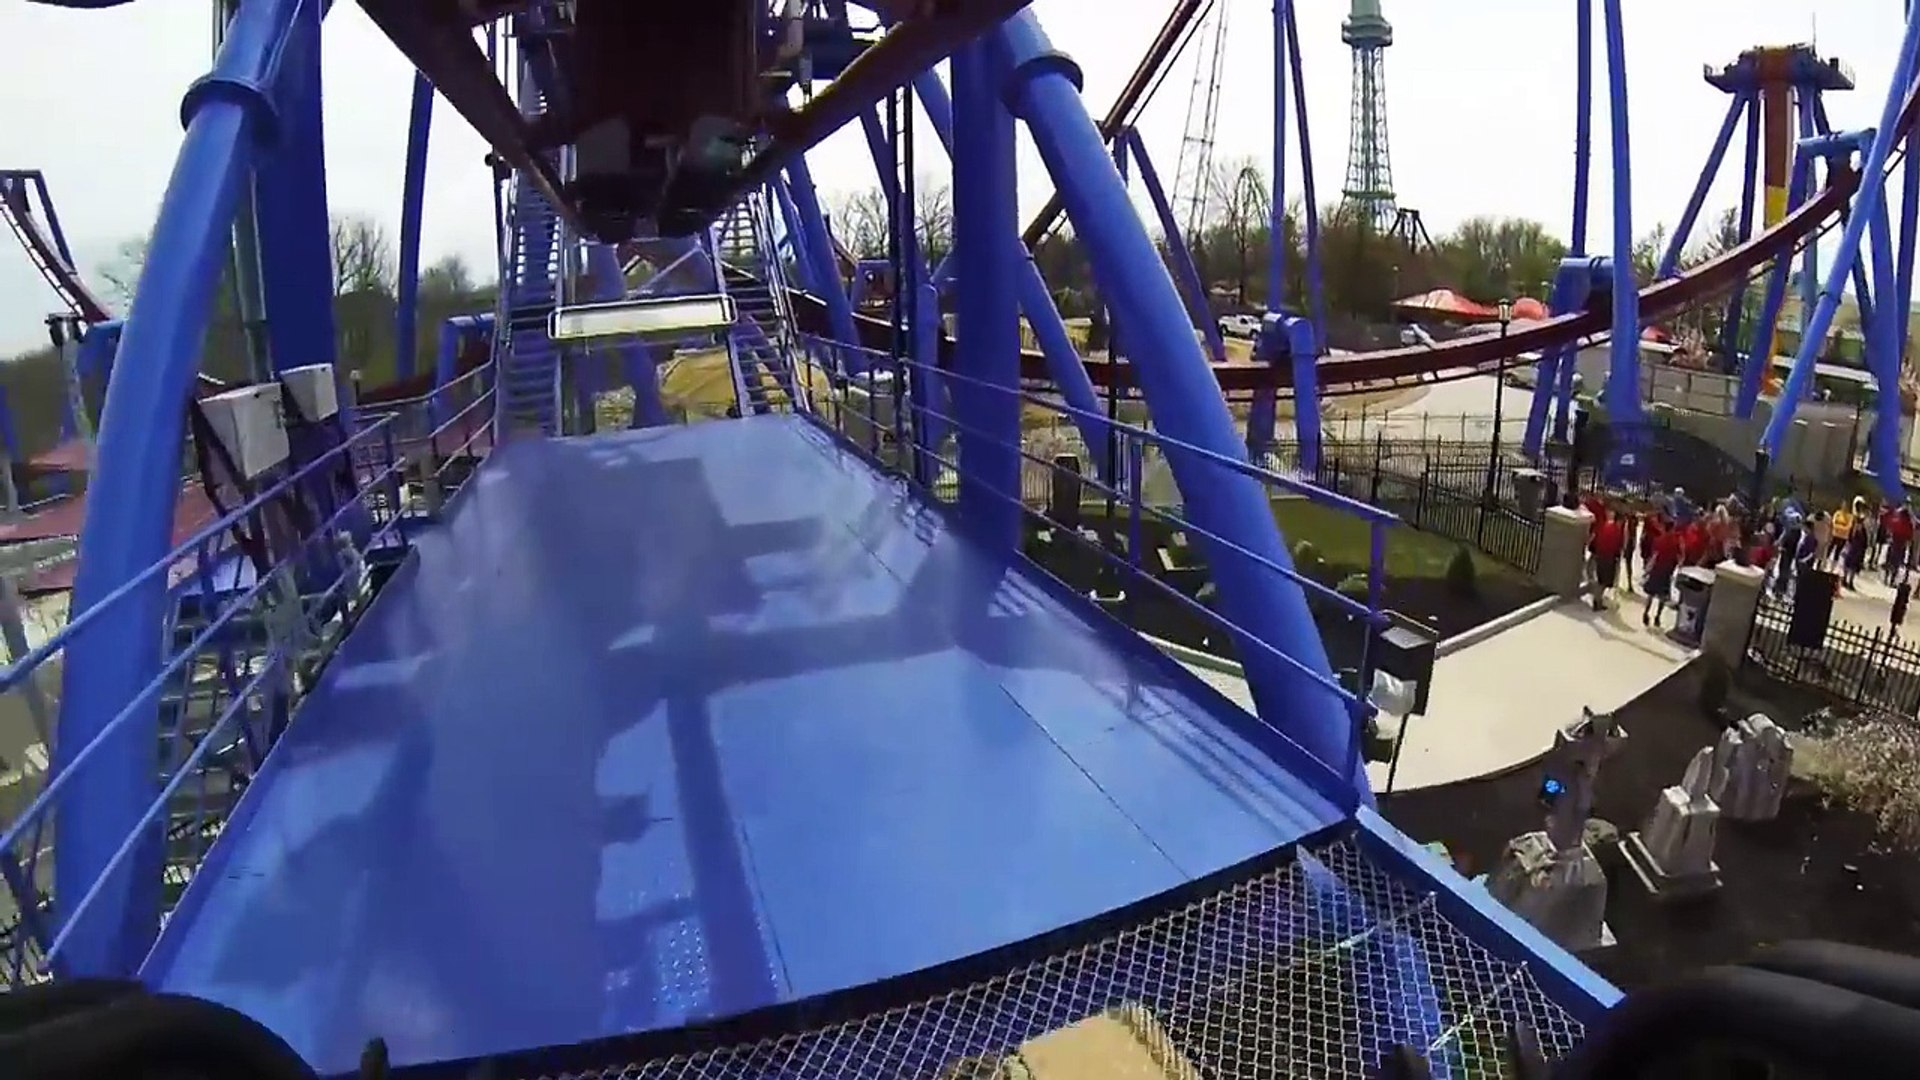 Banshee Roller Coaster REAL POV Kings Island Ohio new AWESOME!